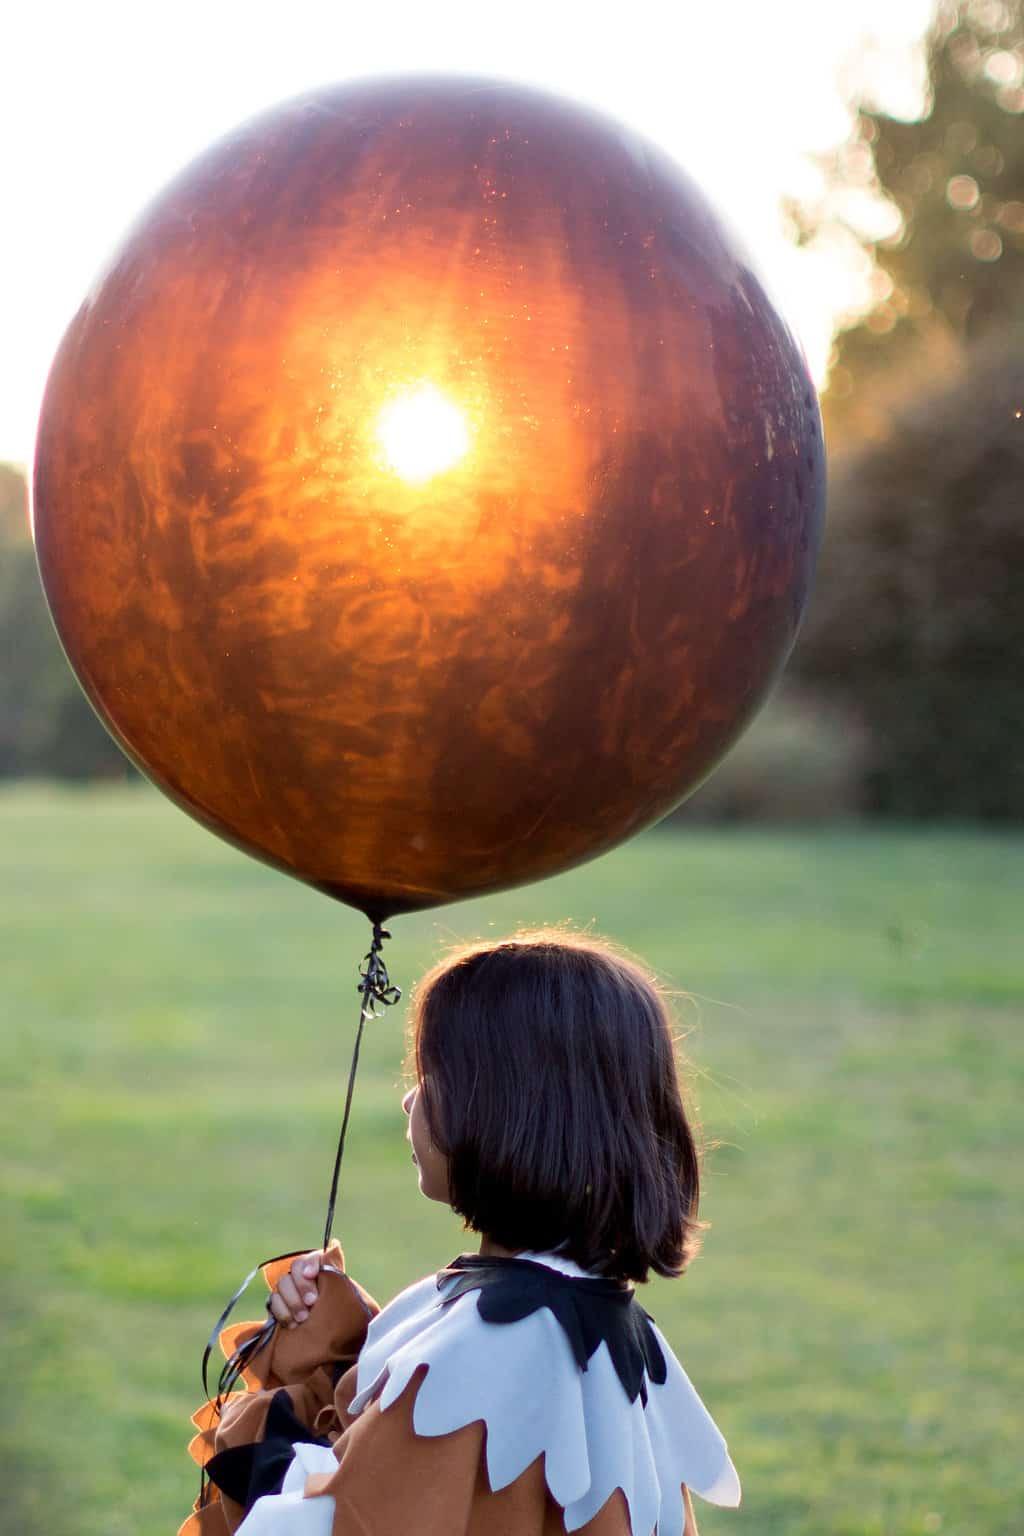 Embracing-The-Magic-of-Halloween-Kid-Style-sun